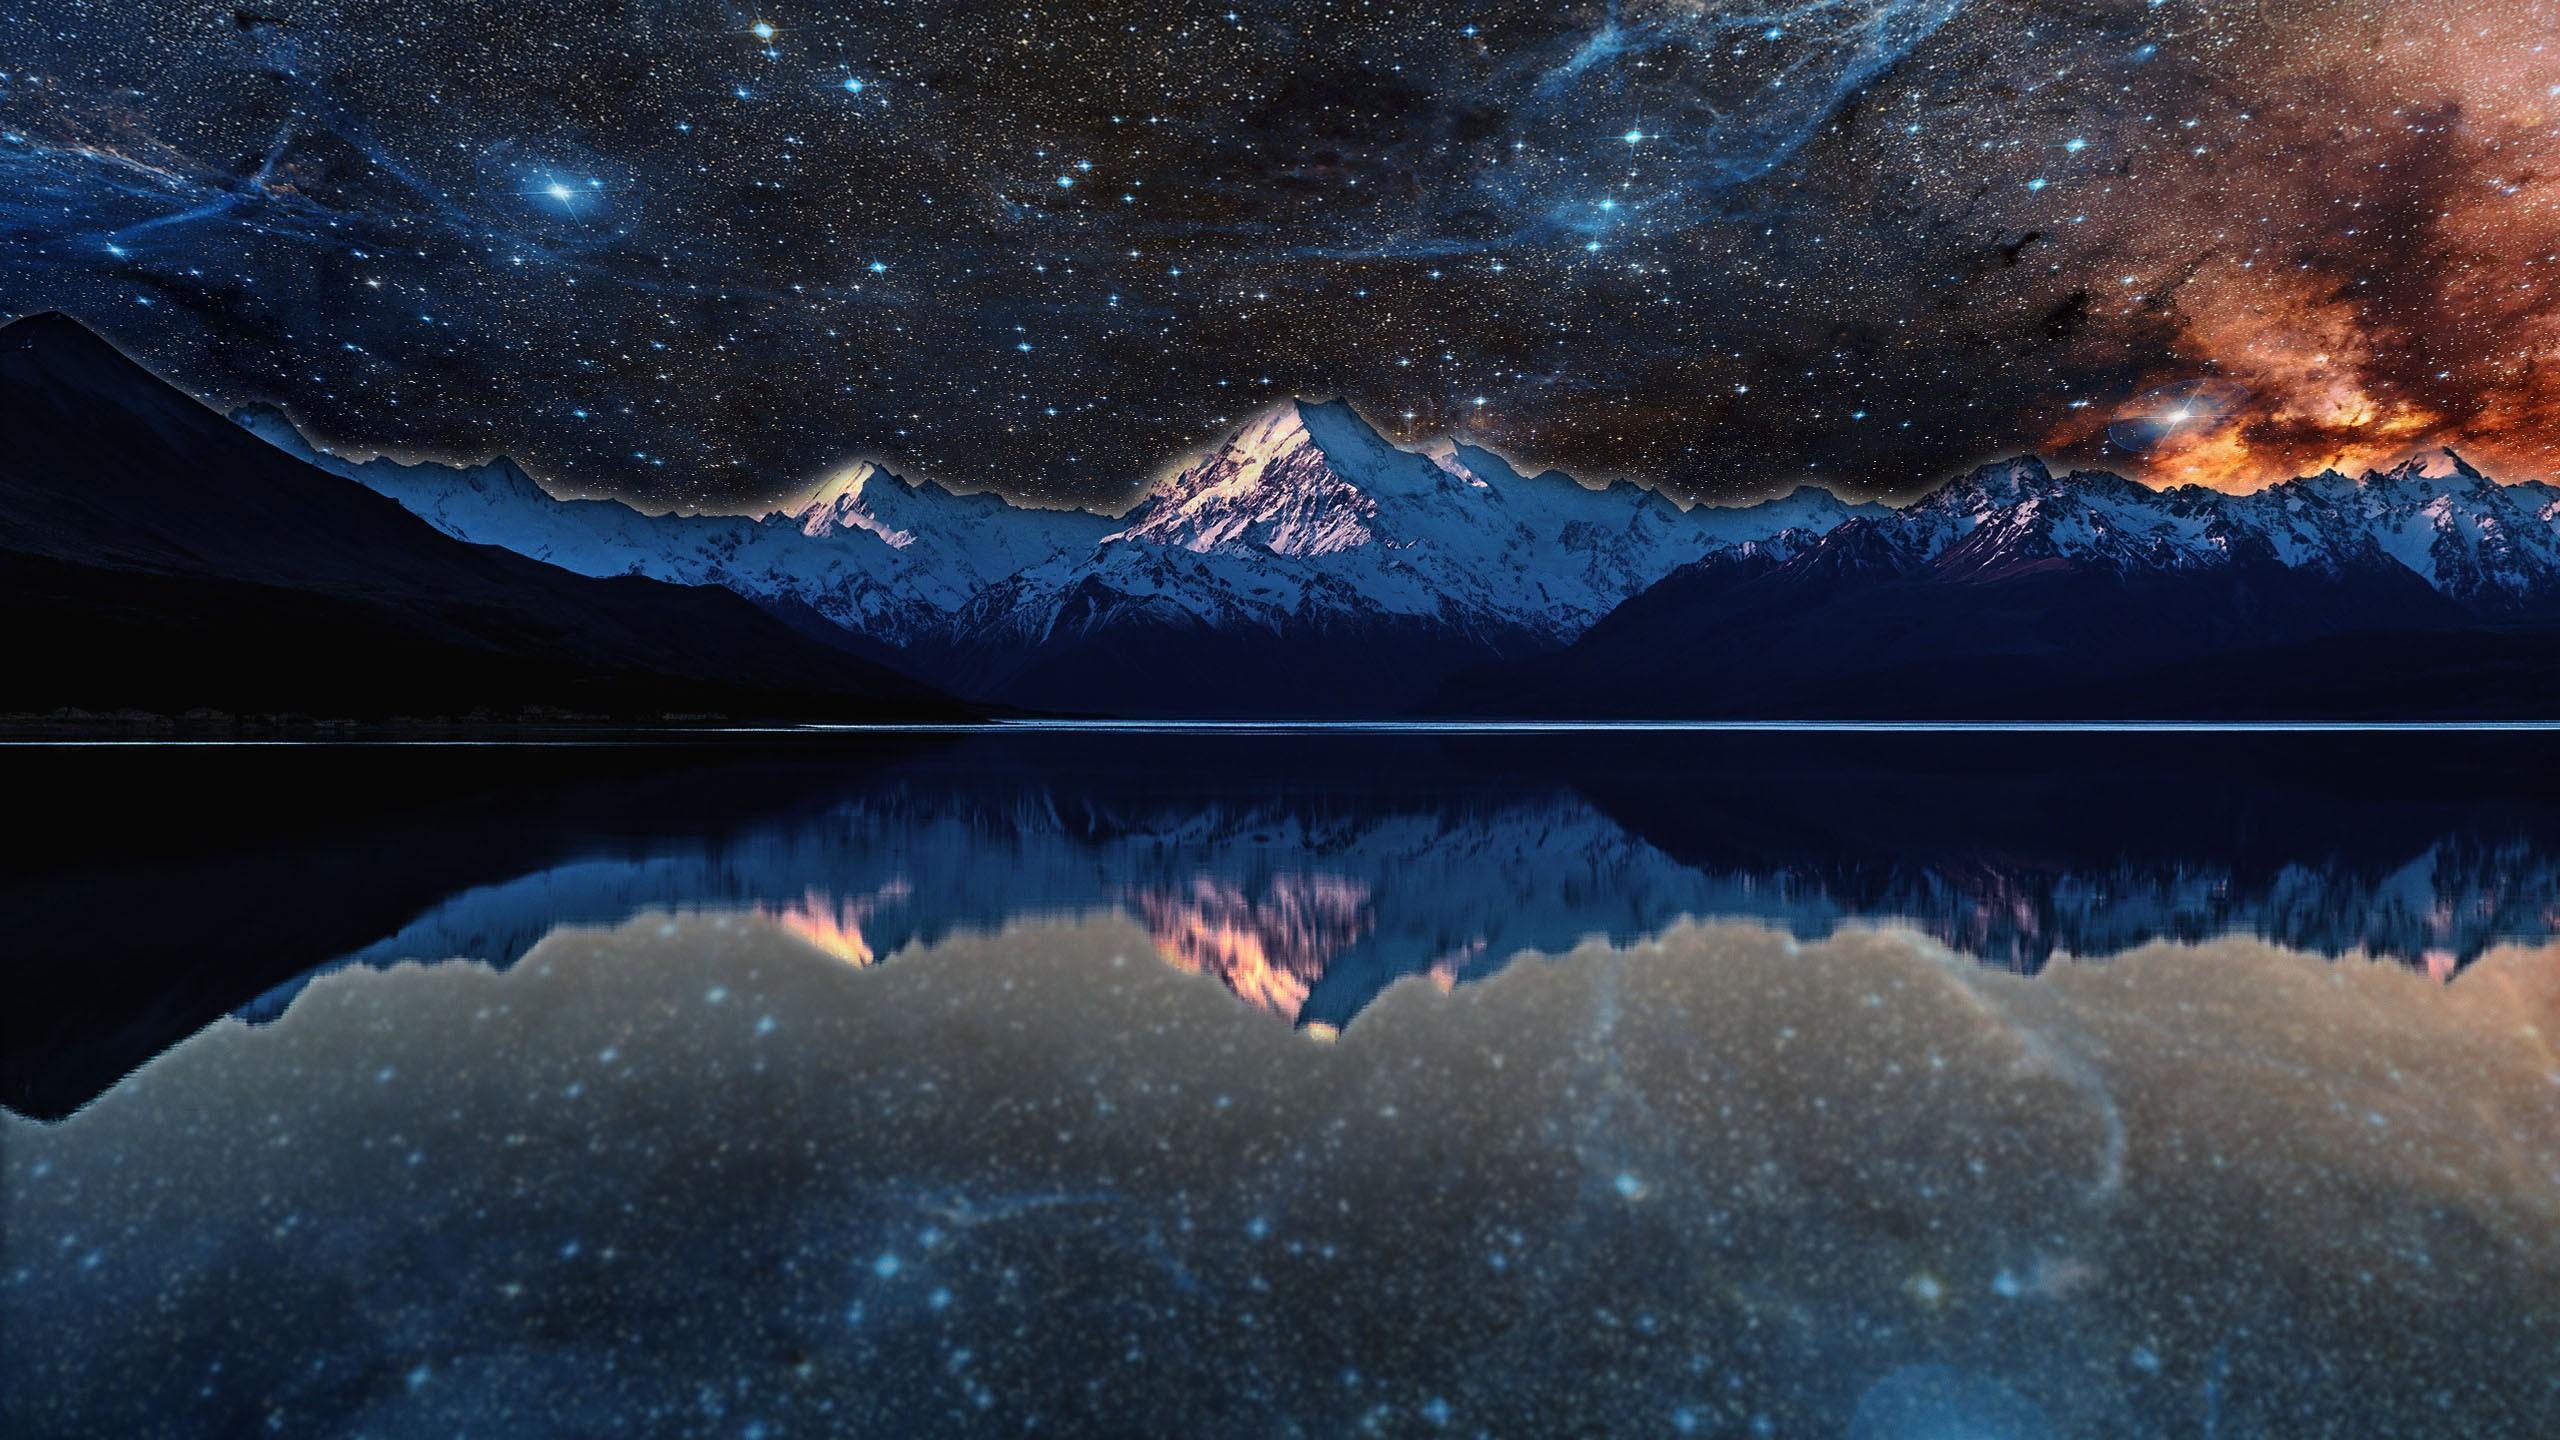 Wallpaper : galaxy, lake, water, reflection, sky, stars